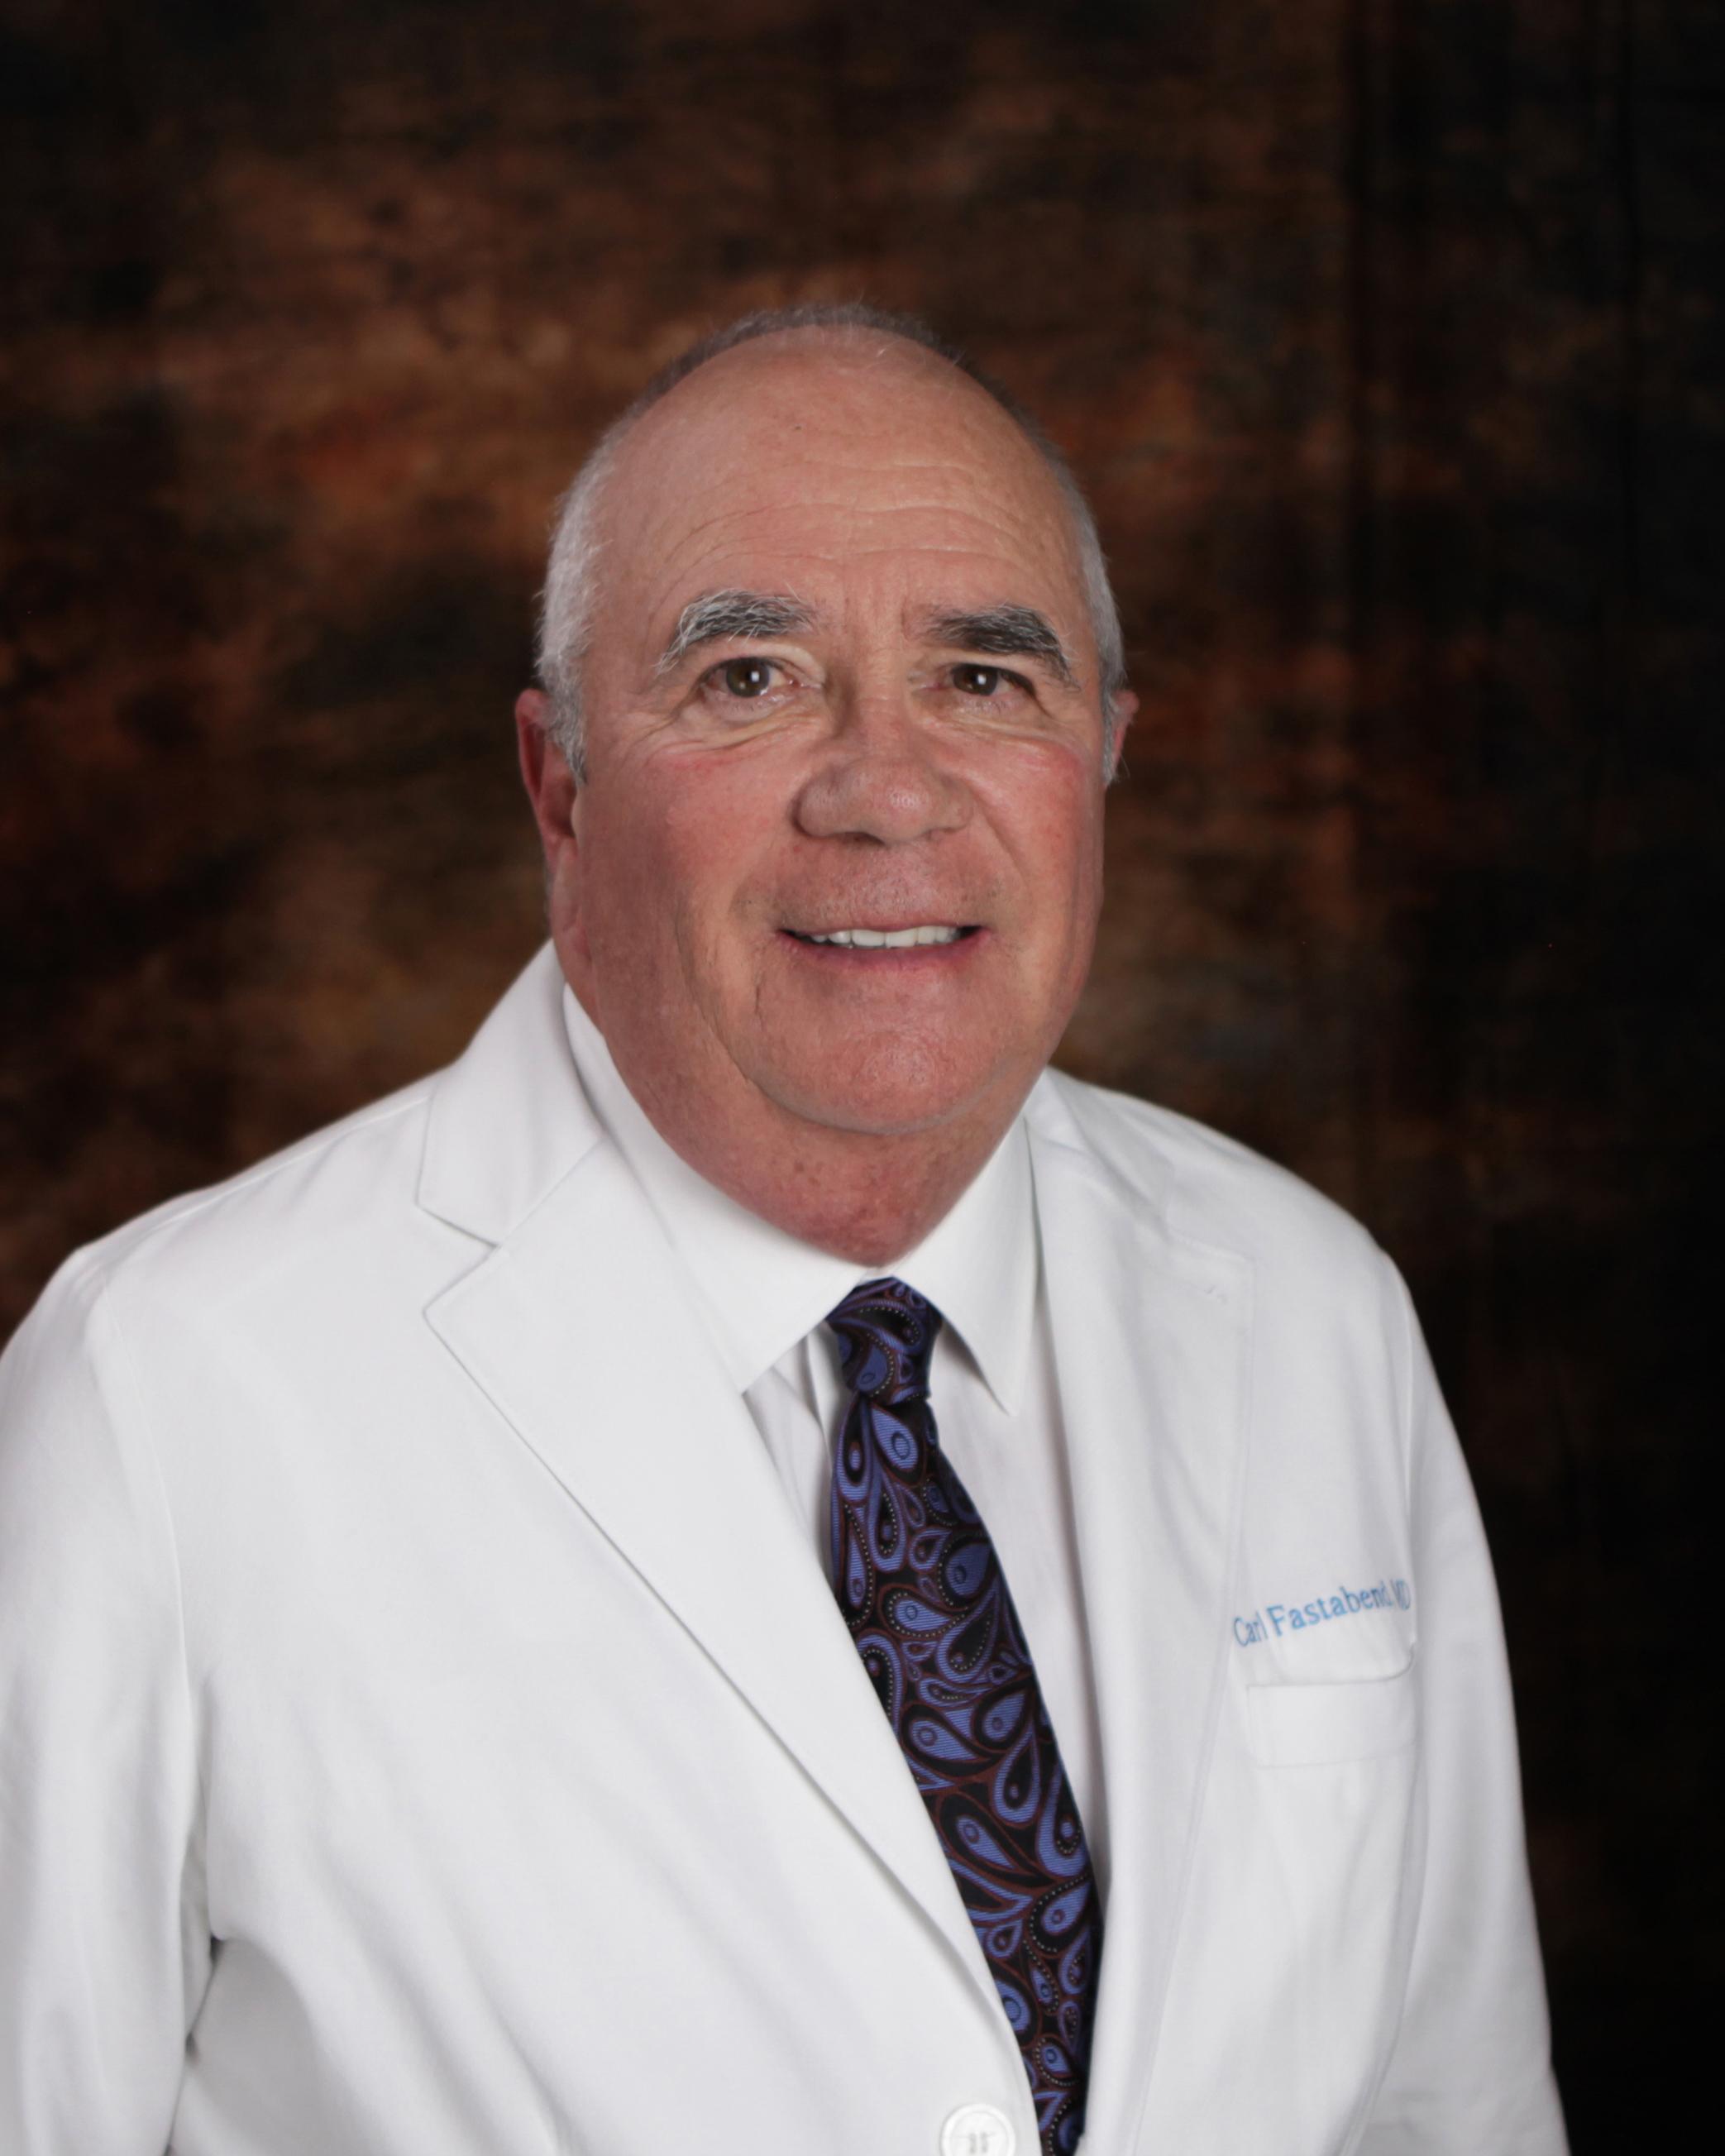 Carl P. Fastabend, MD, FACC